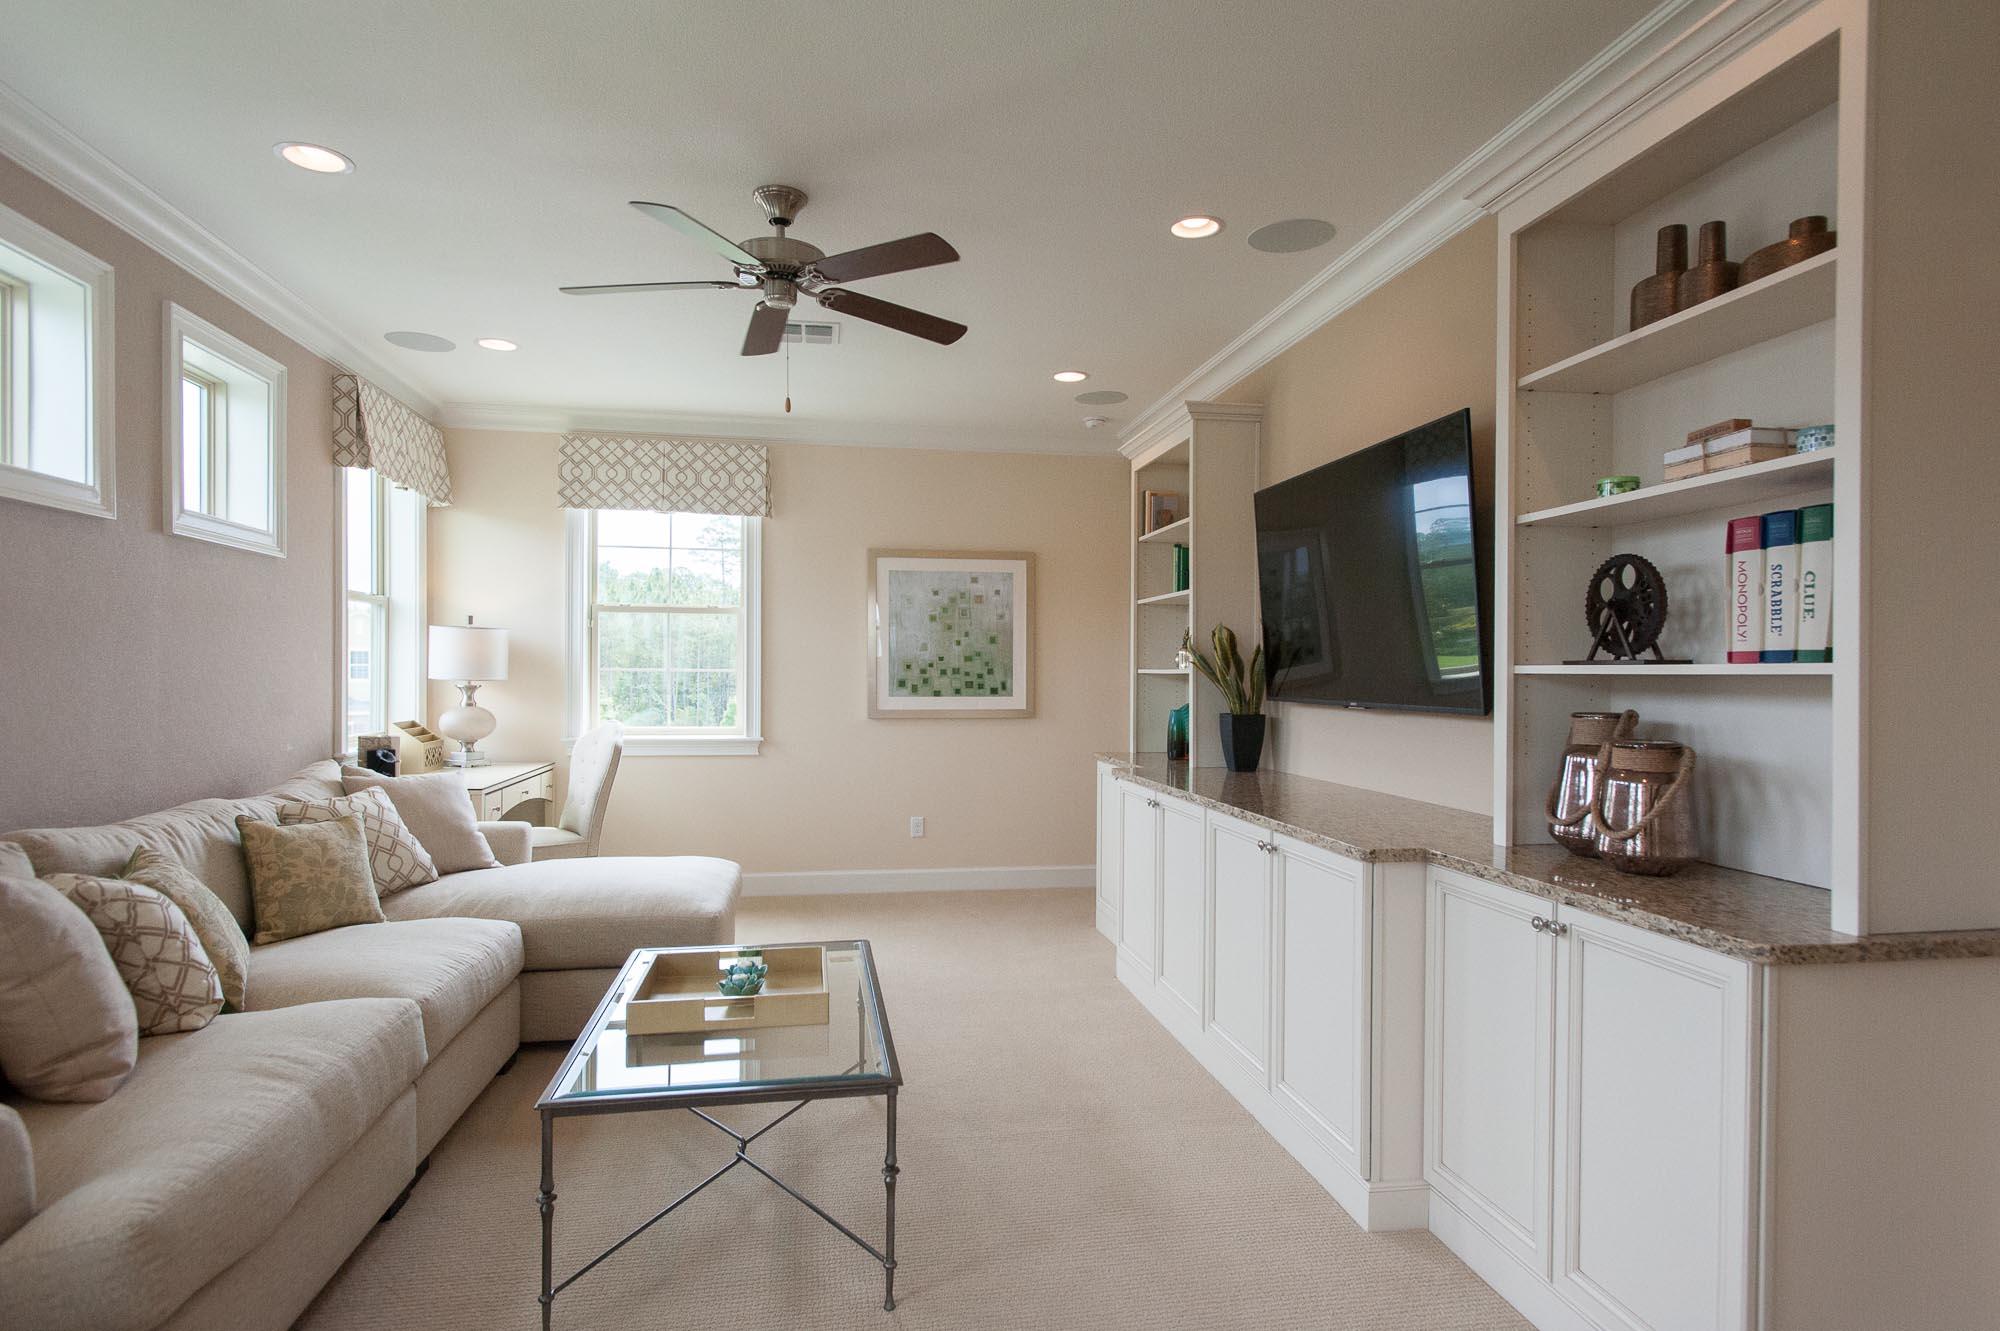 sterling-lennar-celestina-st johns-florida-nefba-northeast florida-southeastern united states-residential interior design-contemporary-transitional-built in-custom-crown-millwork.jpg